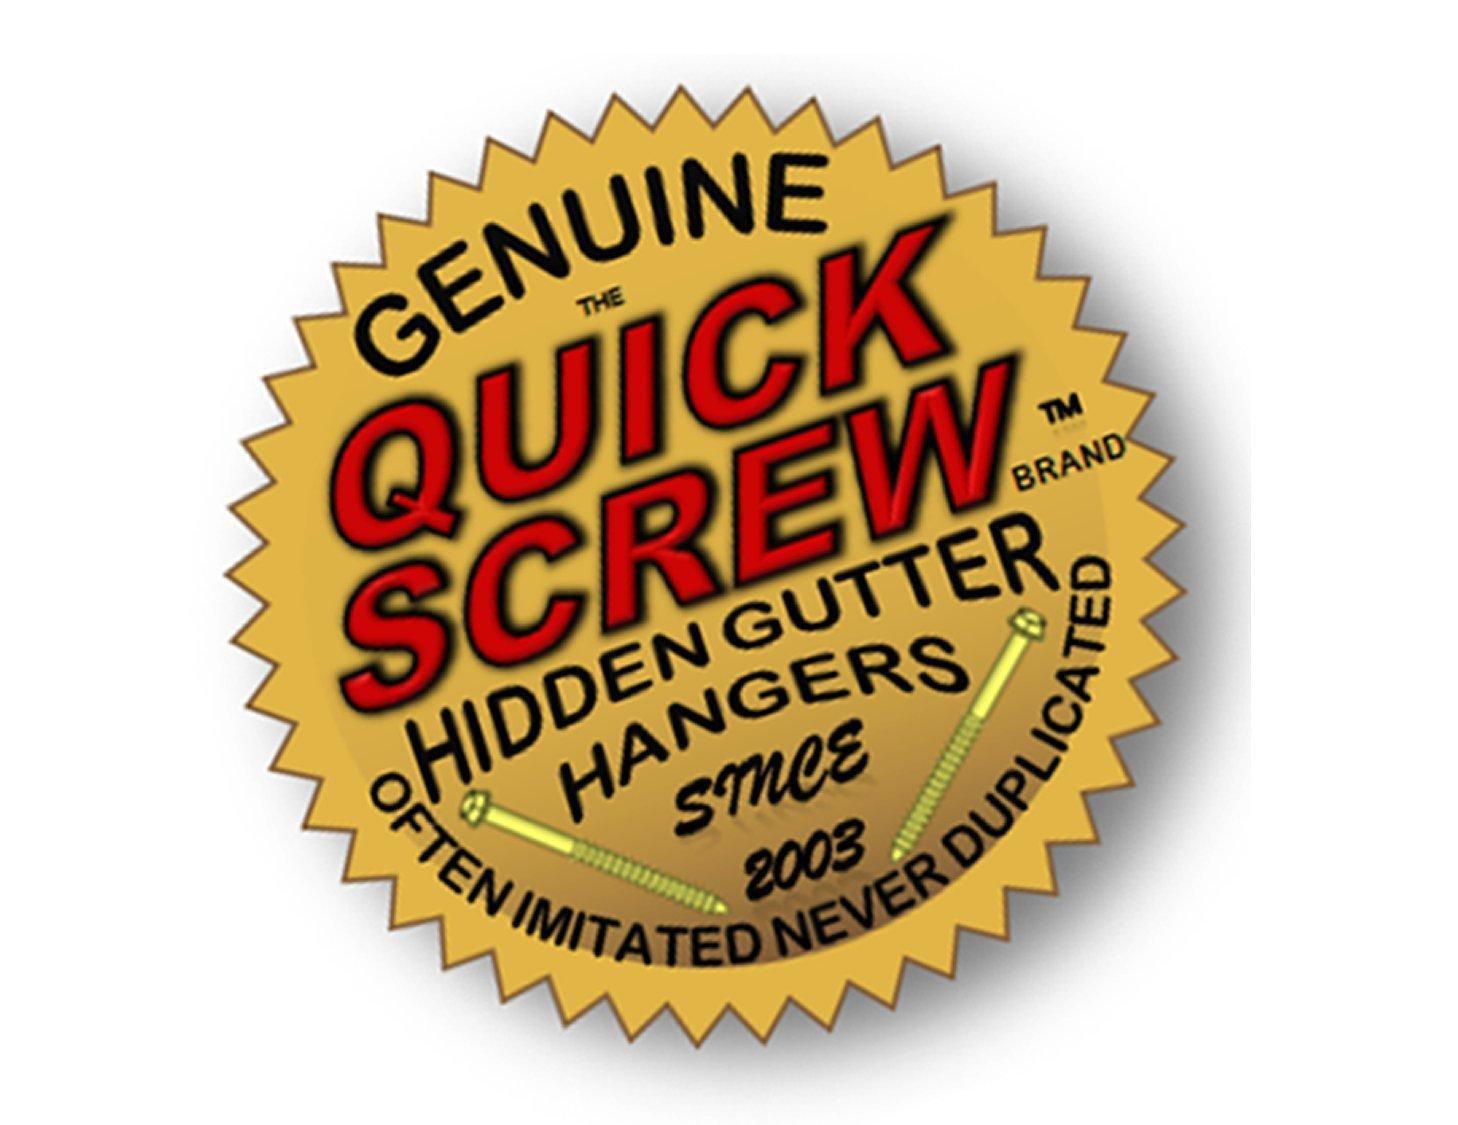 Quick Screw 5'' 50 Pack Premium Hidden Rain Gutter Bracket Hook Hangers with screw clip style by QuickScrew